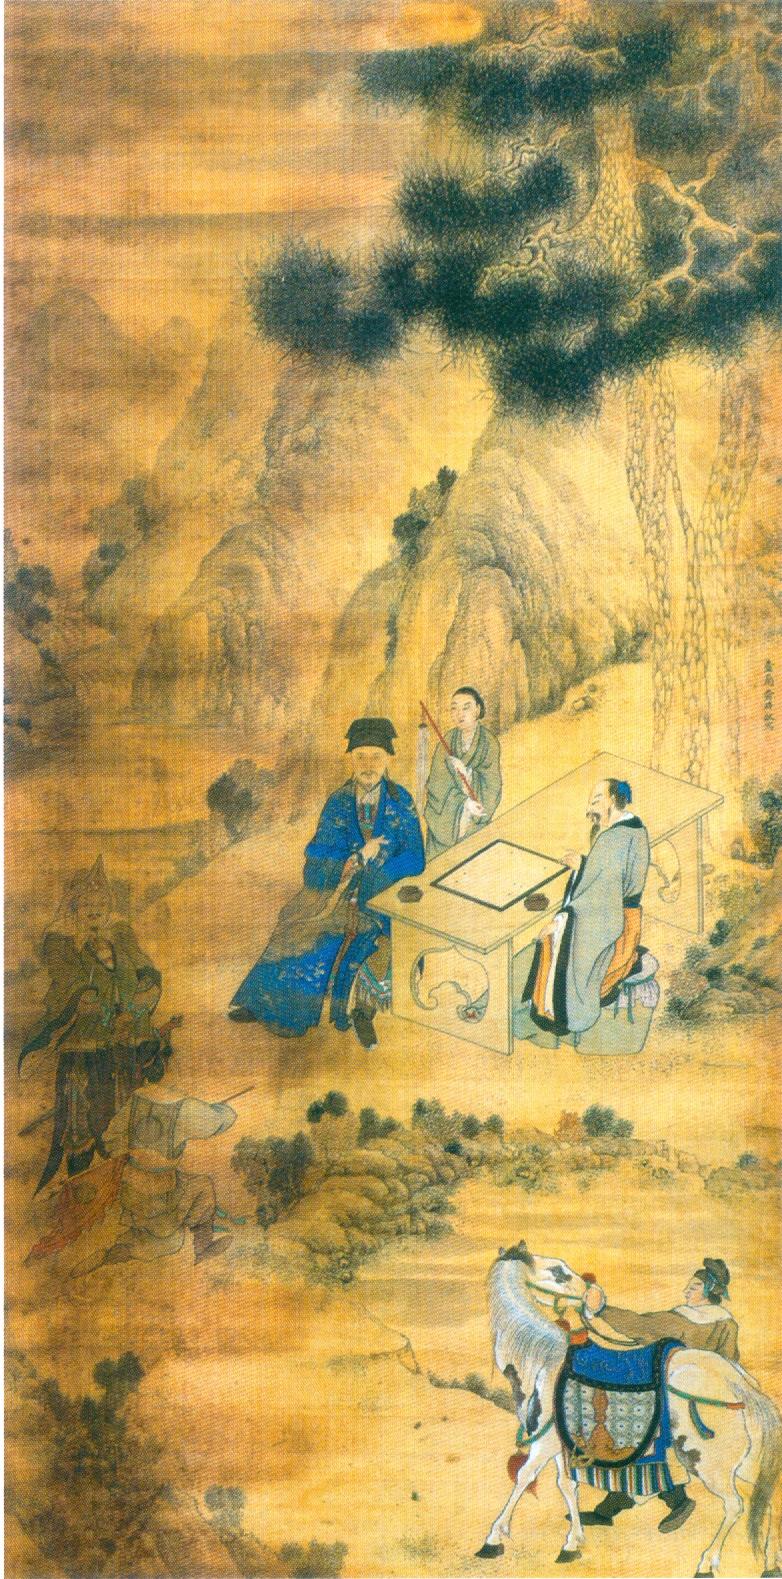 Portrait of Zheng Chenggong by Huang Zi 黃梓 (17th century). License Public Domain